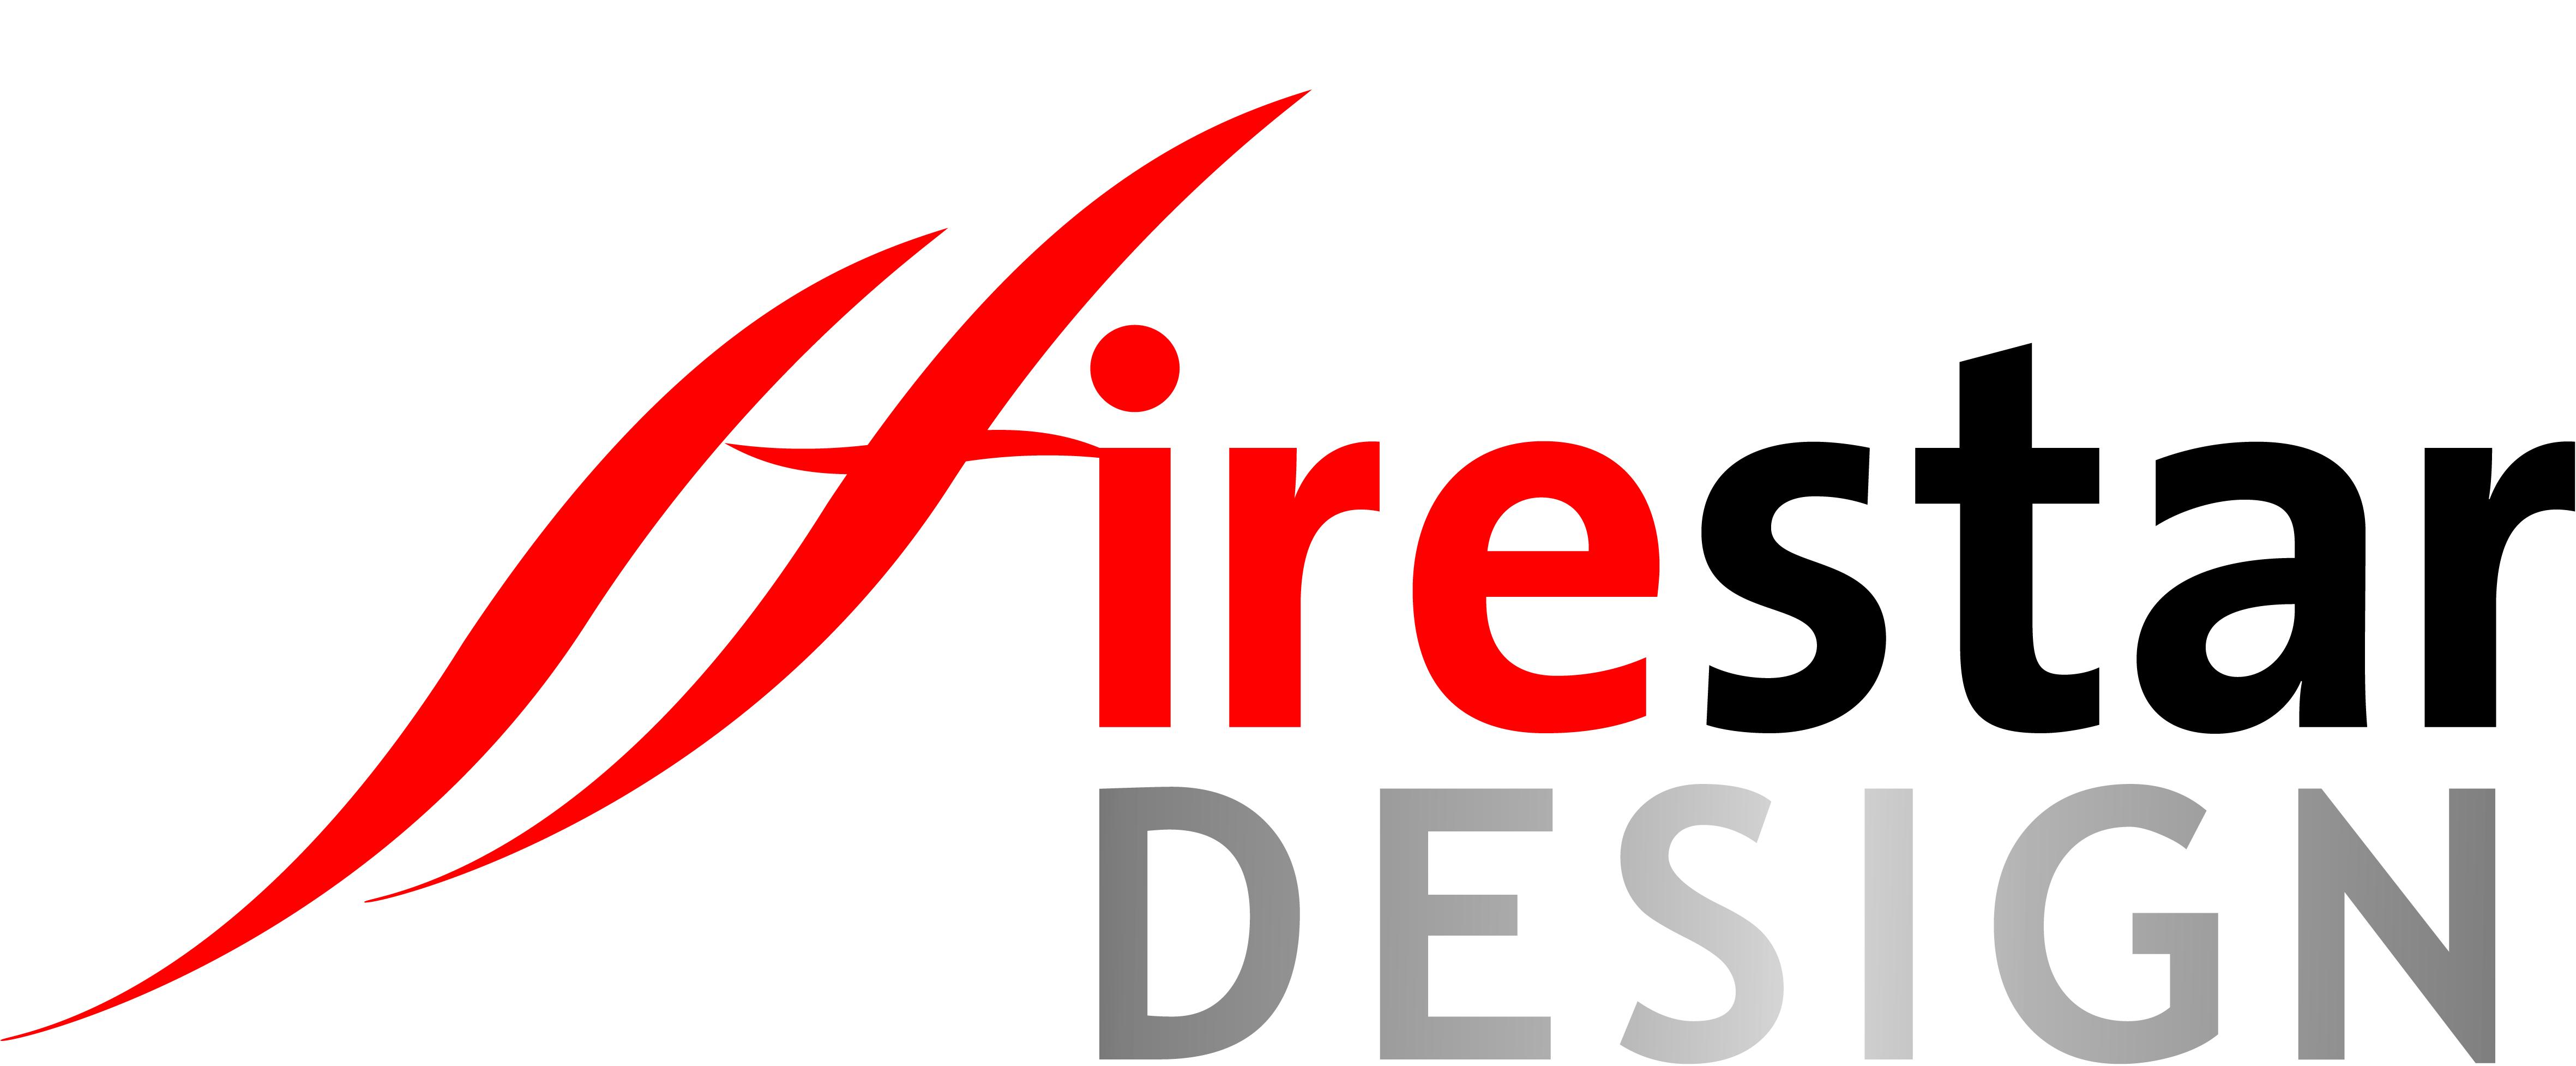 Barbecue firestar design